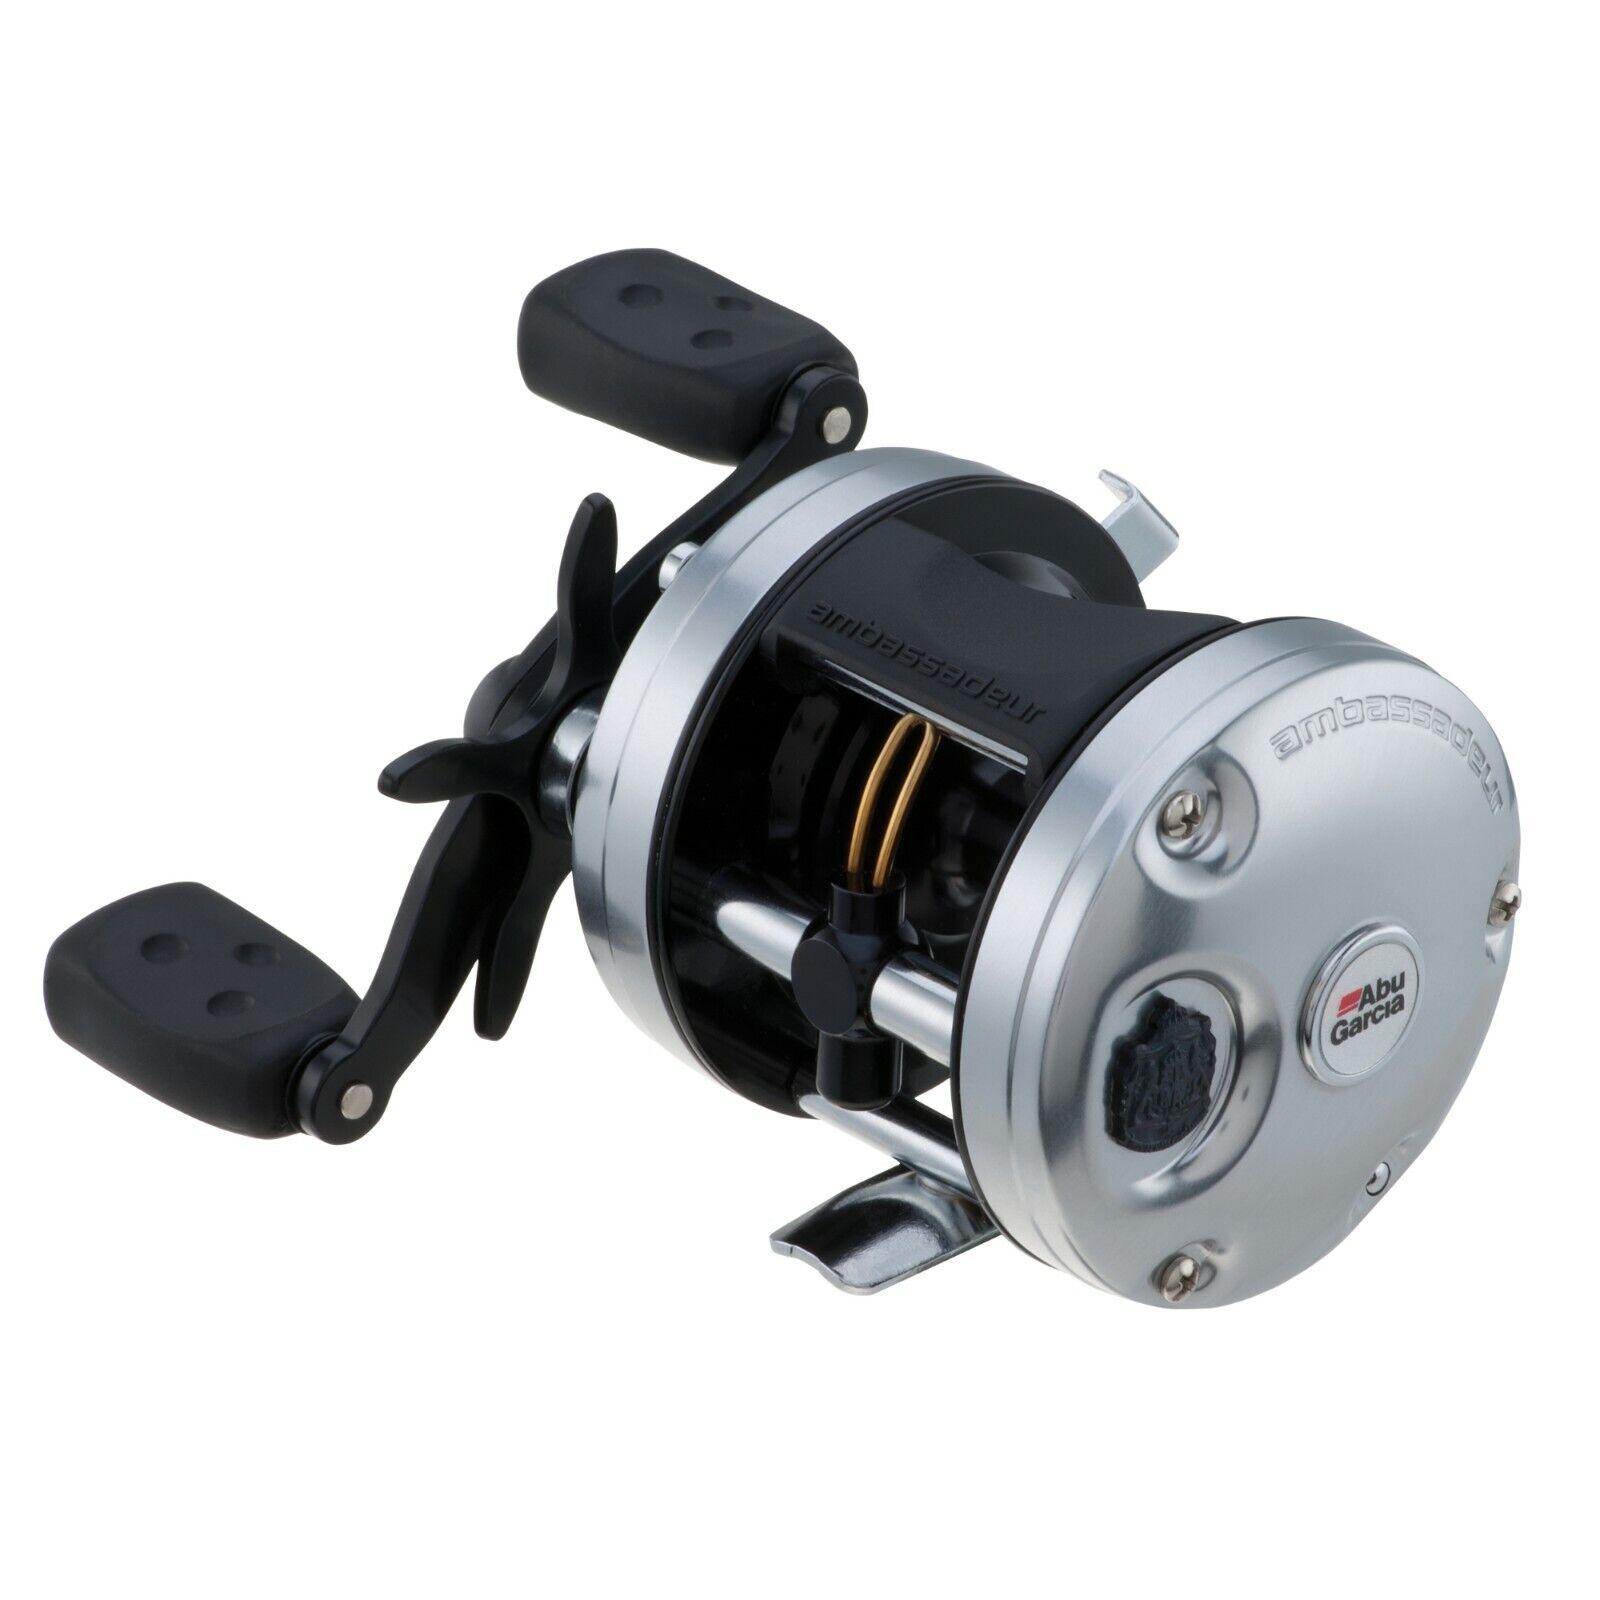 Abu Garcia Ambassadeur Classic 5500 C3  Multiplier Fishing Reel for Rod 1292720